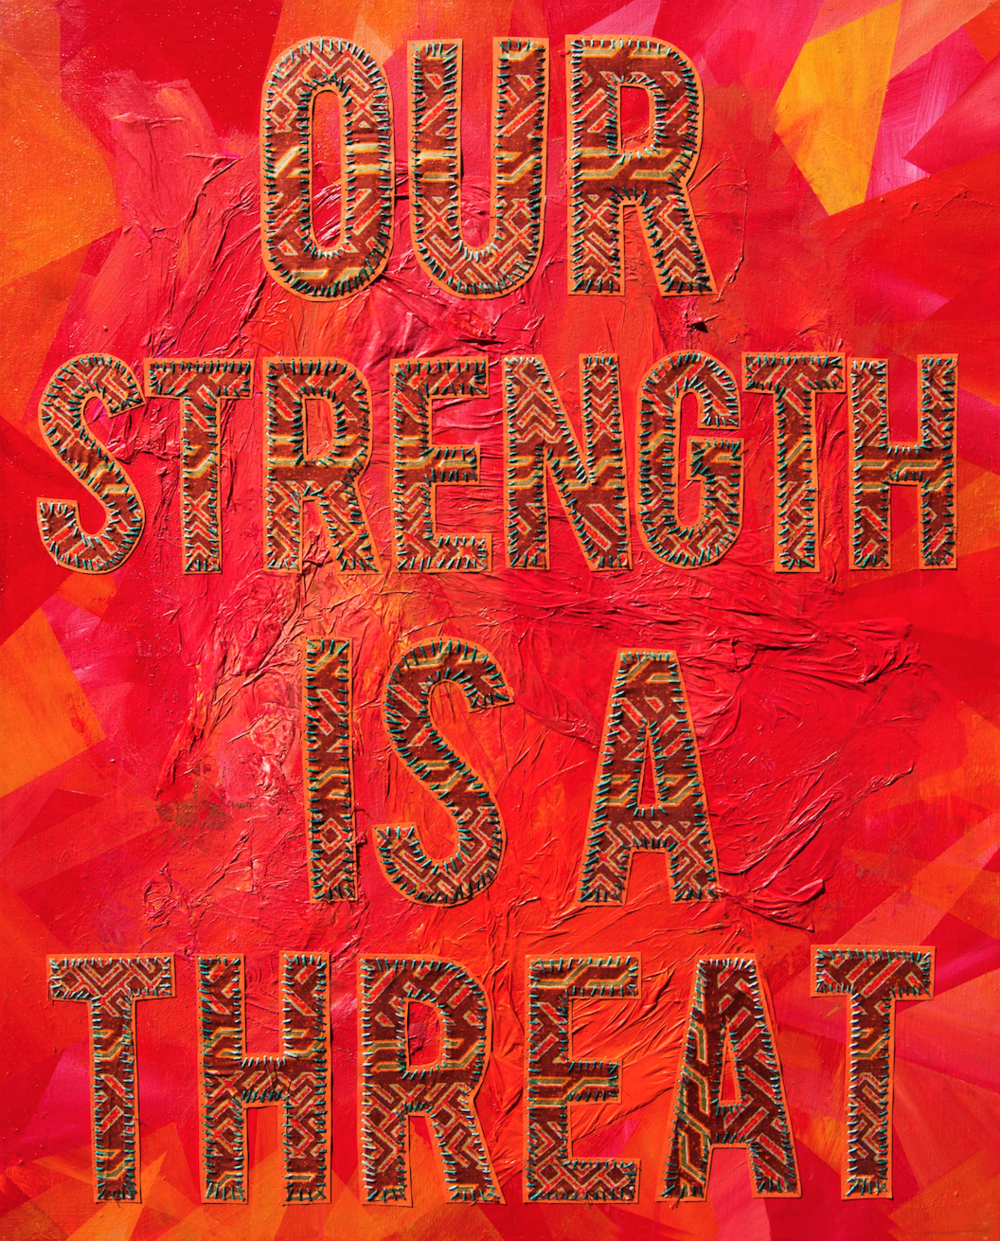 aliana grace bailey strength threat full artist.png